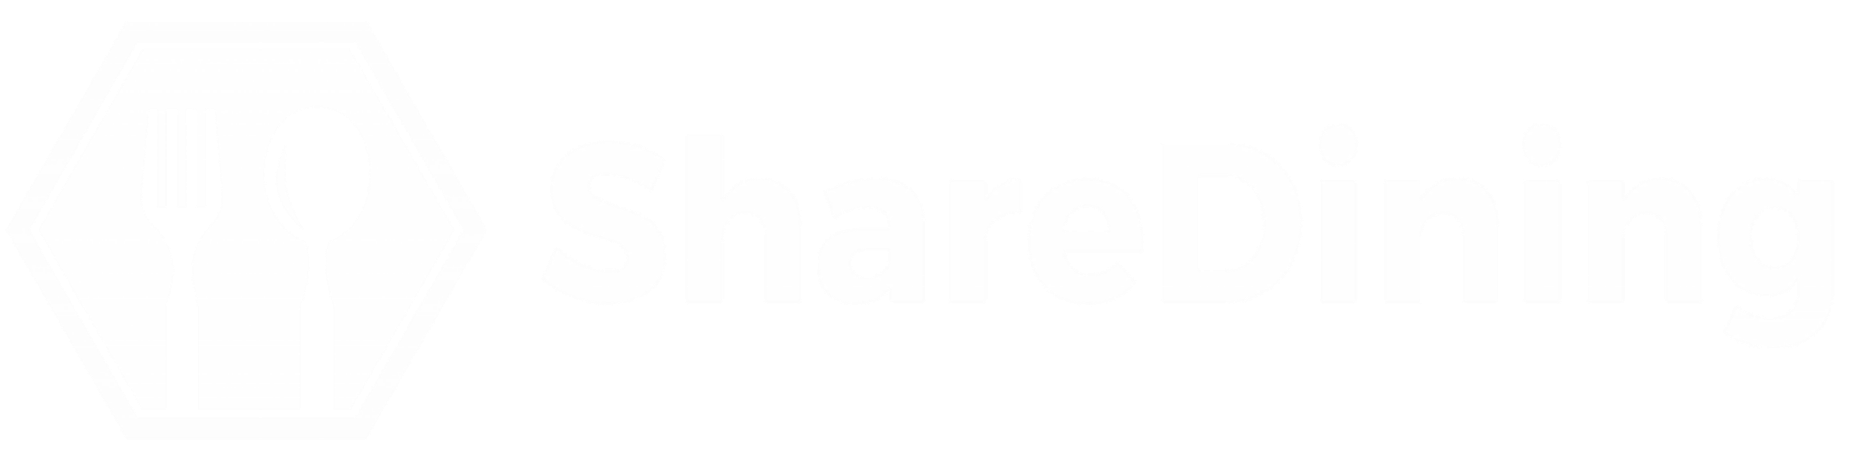 ShareDining Horizontal Logo - White